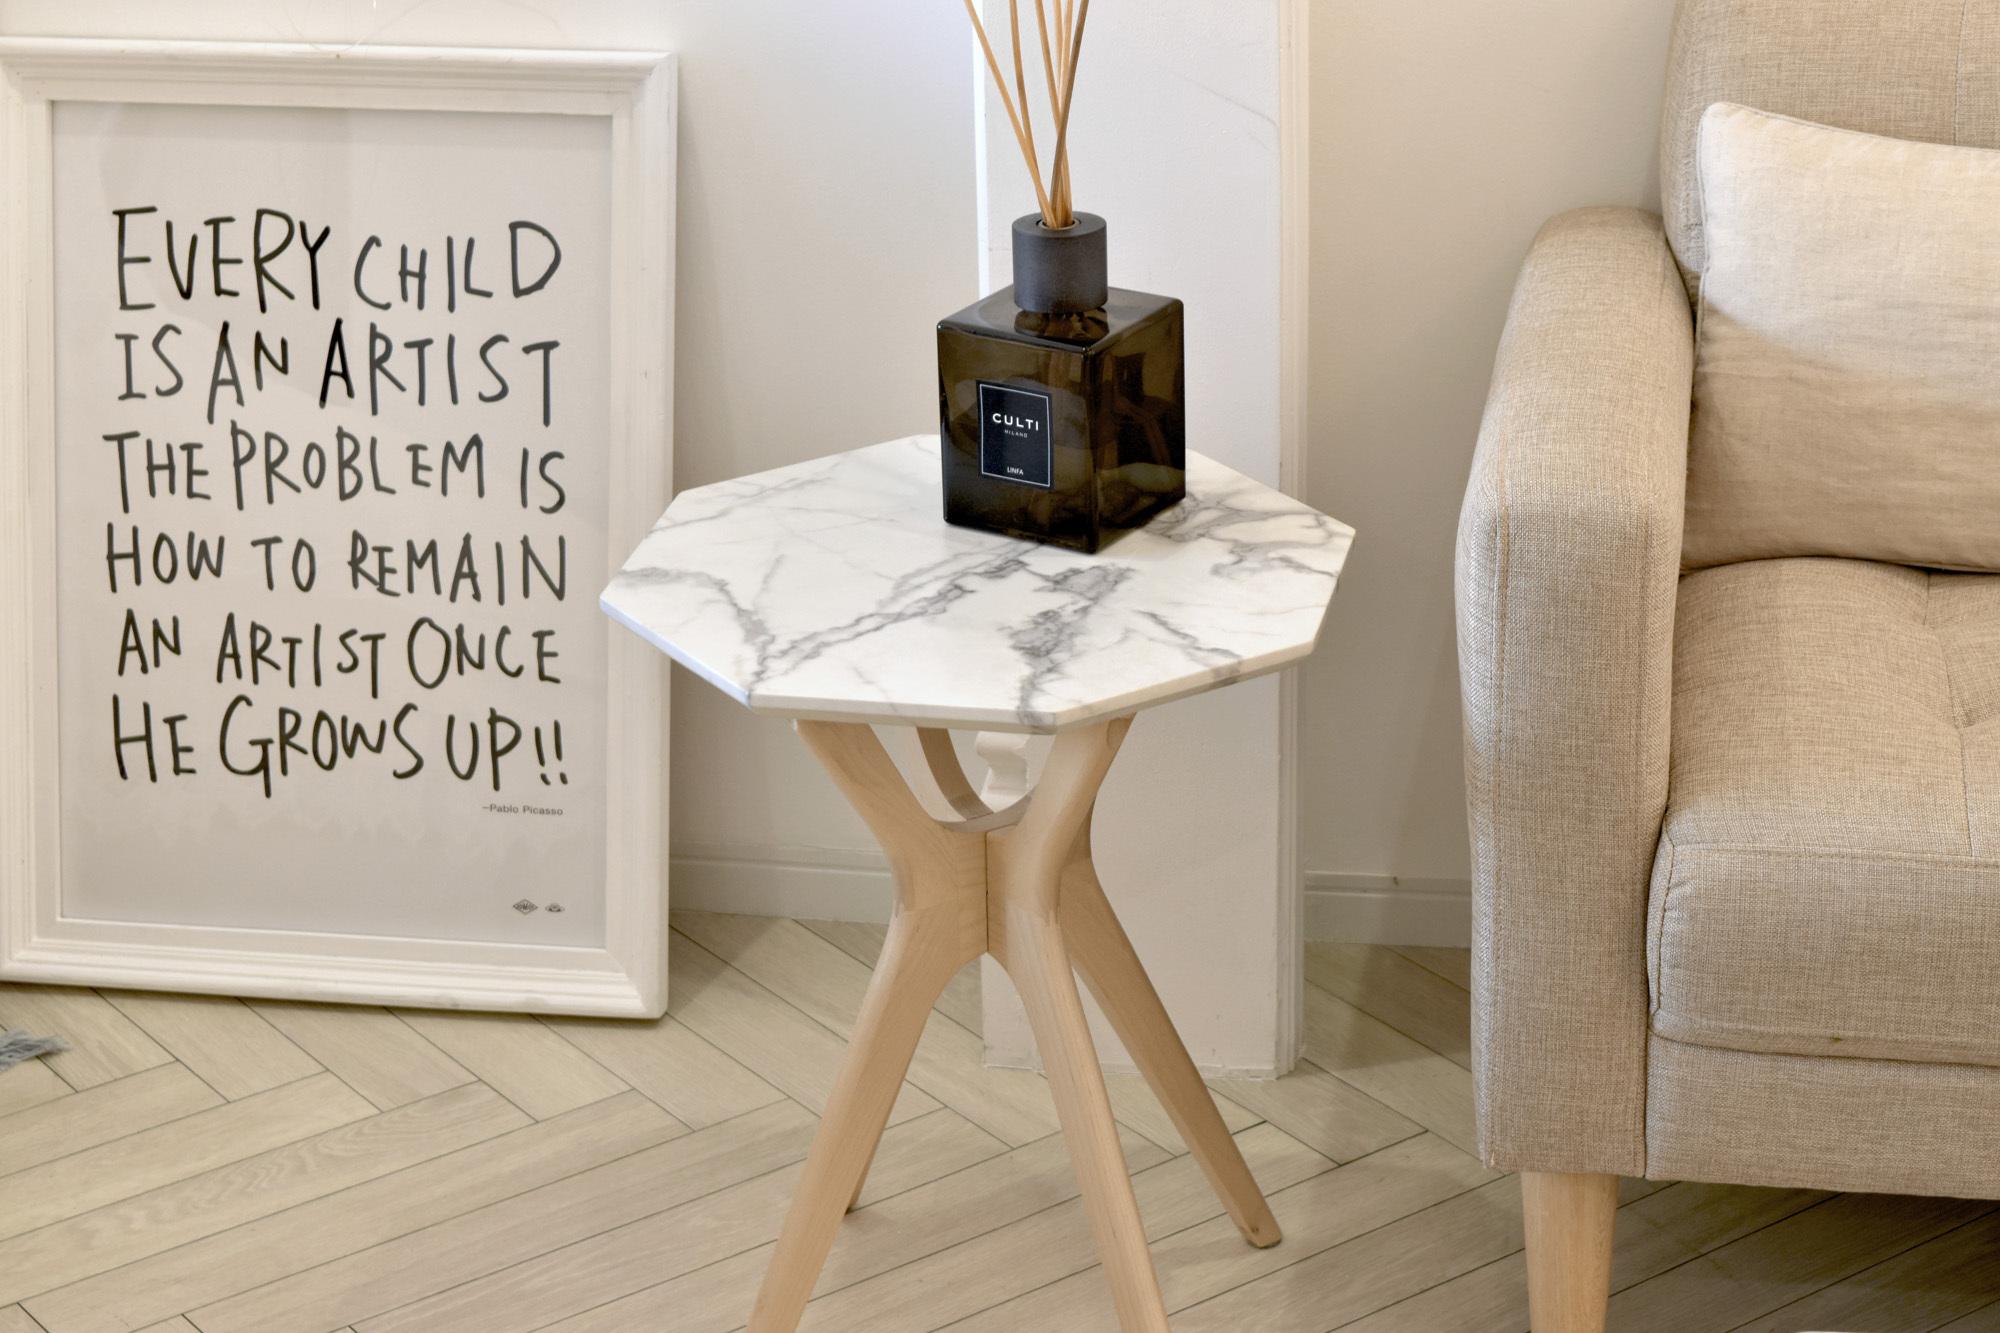 Marble Side Table 400 / 大理石モダンスタイル 大理石調 サイドテーブル 400